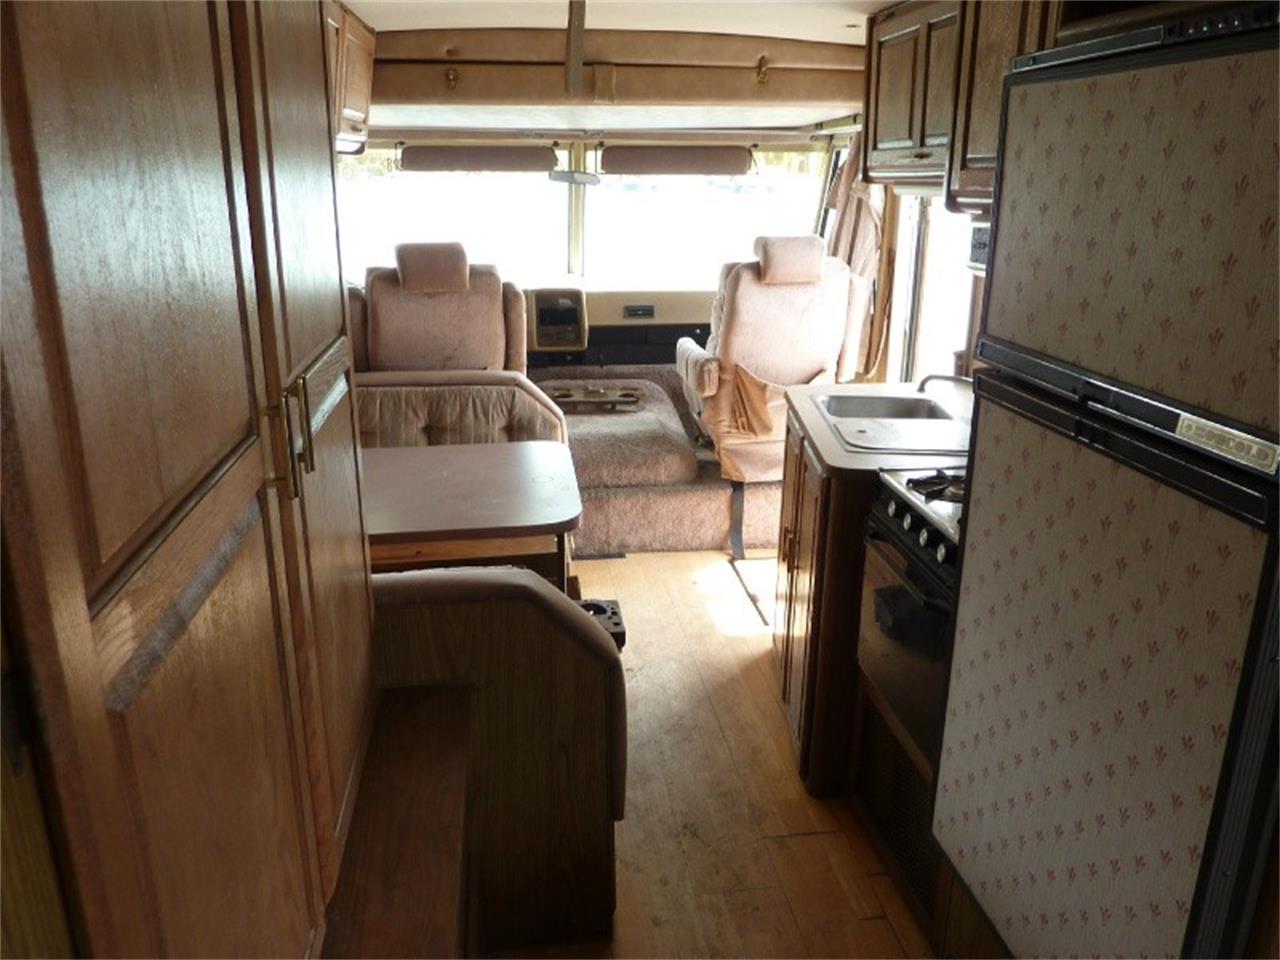 1987 Winnebago Chieftain For Sale Classiccarscom Cc 1205886